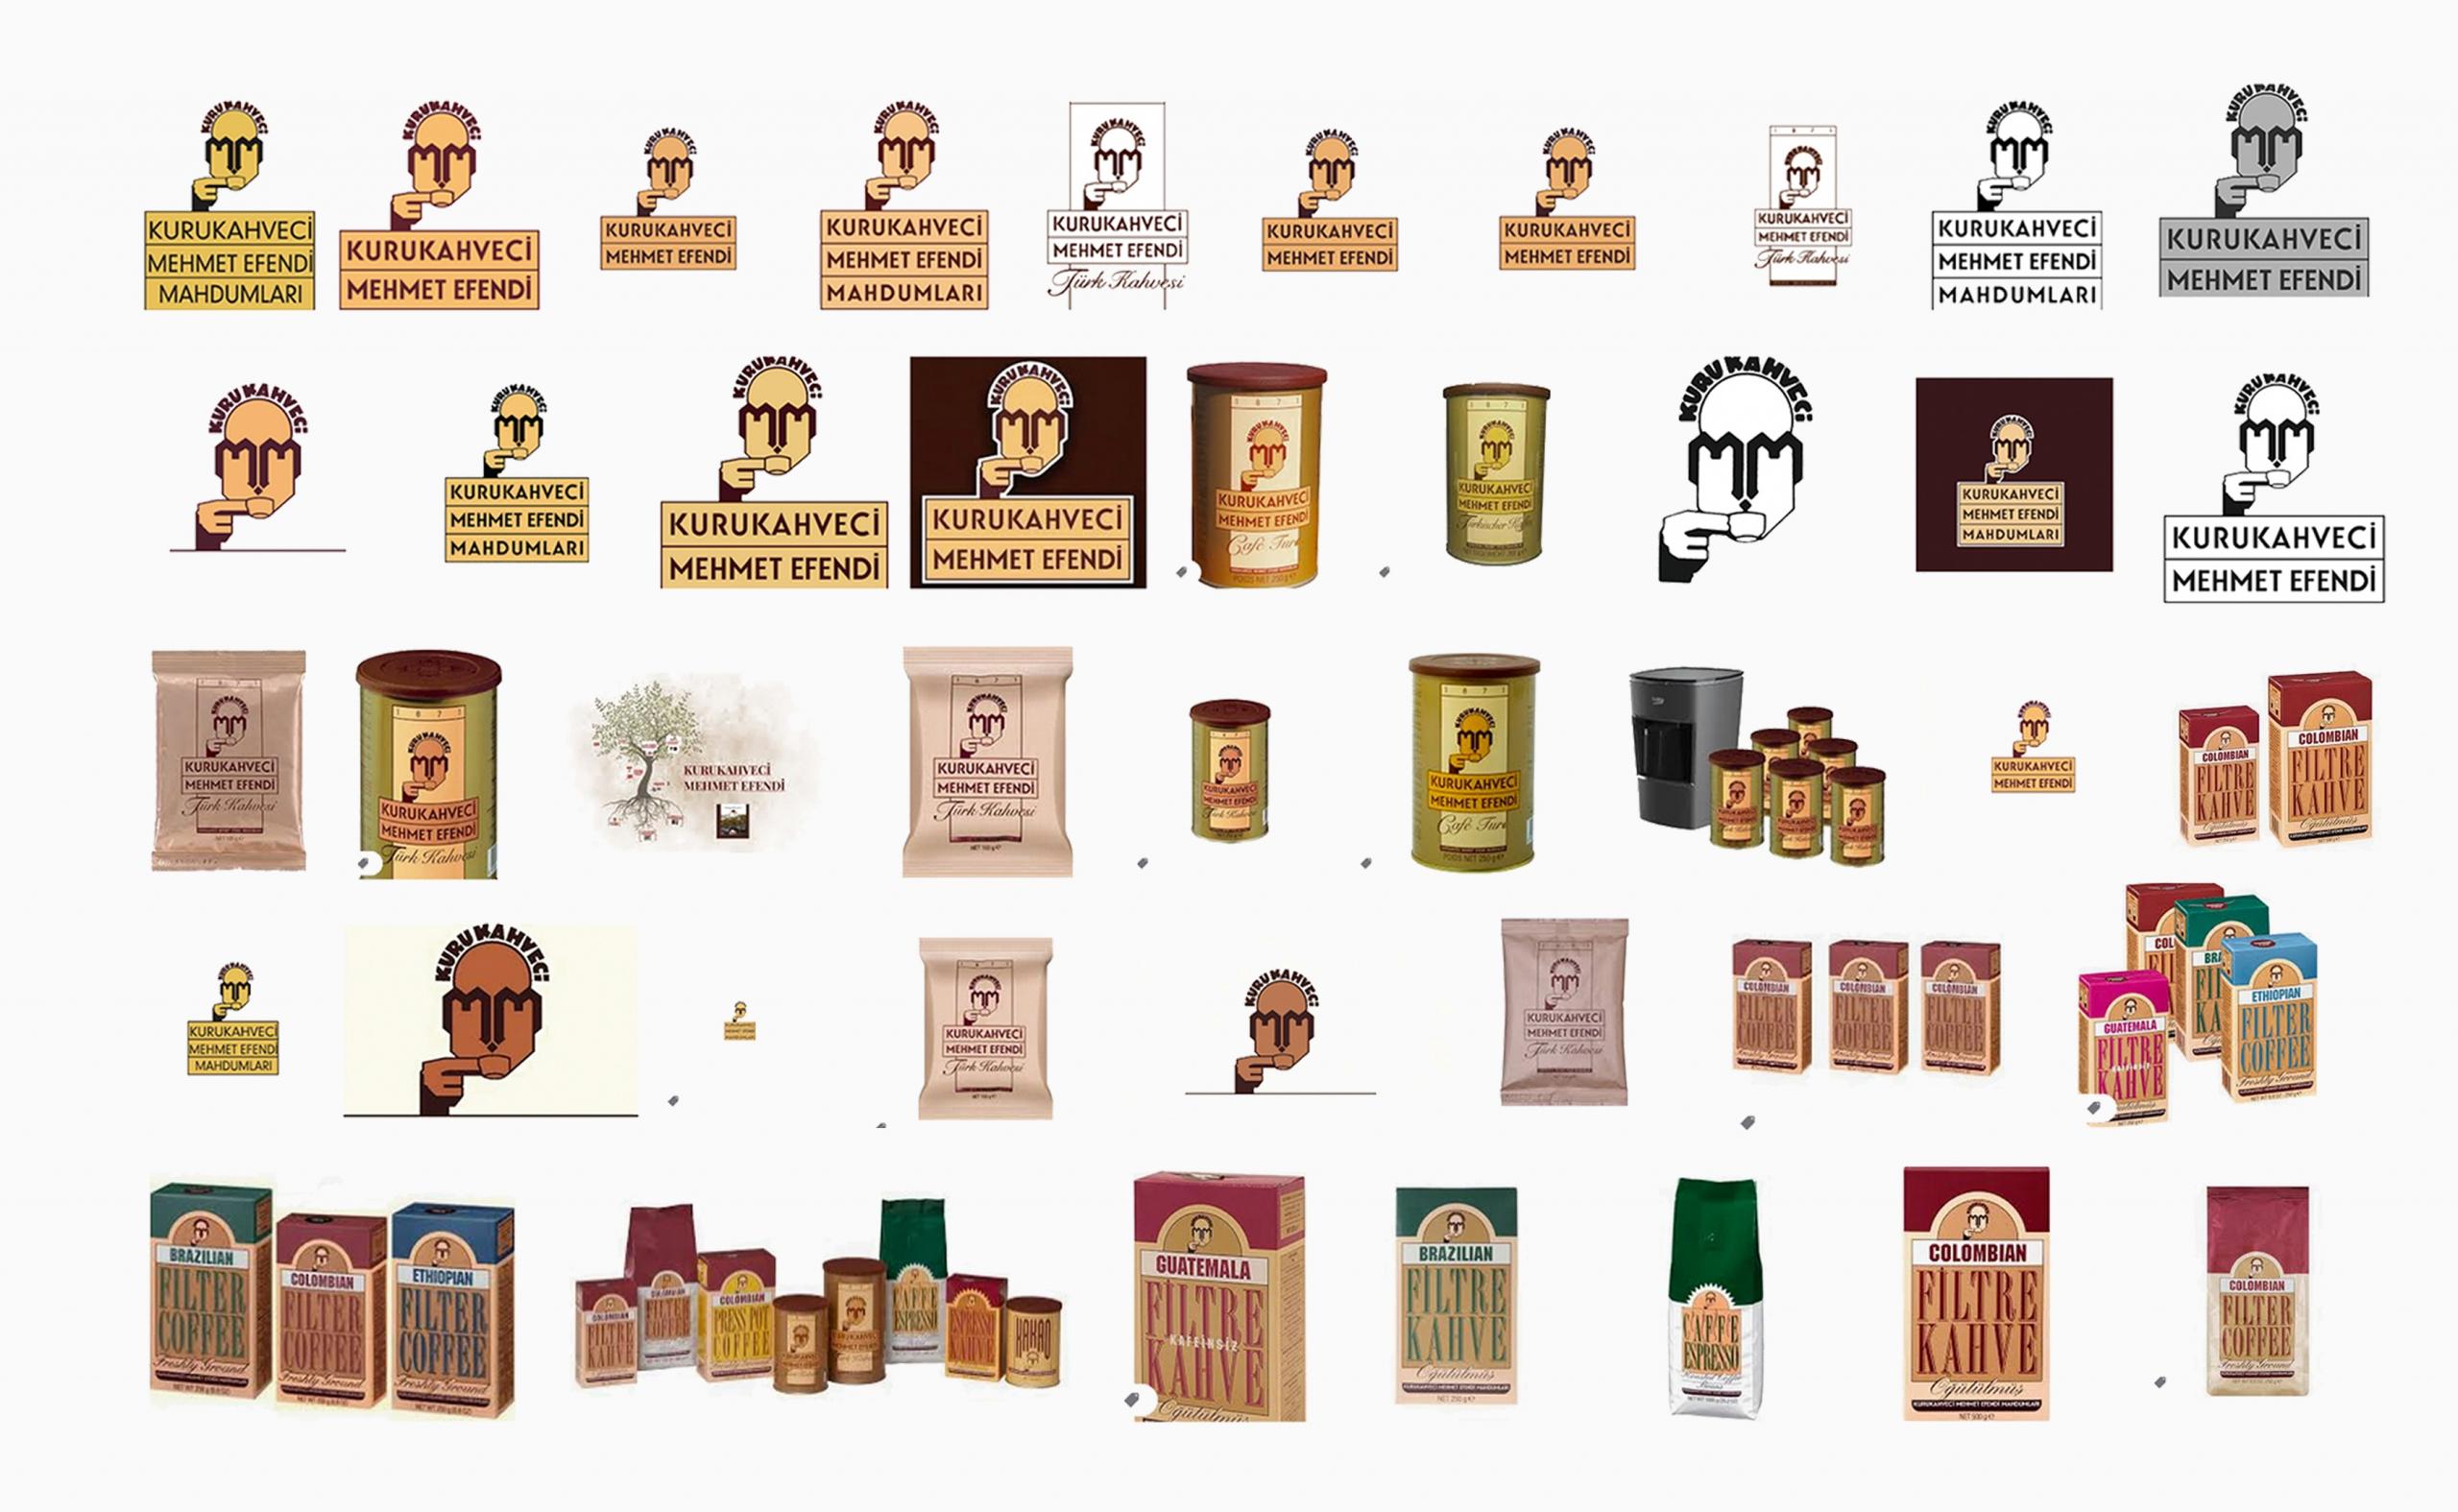 emretelli_kurukahveci-coffee_corporate_logo_search-results